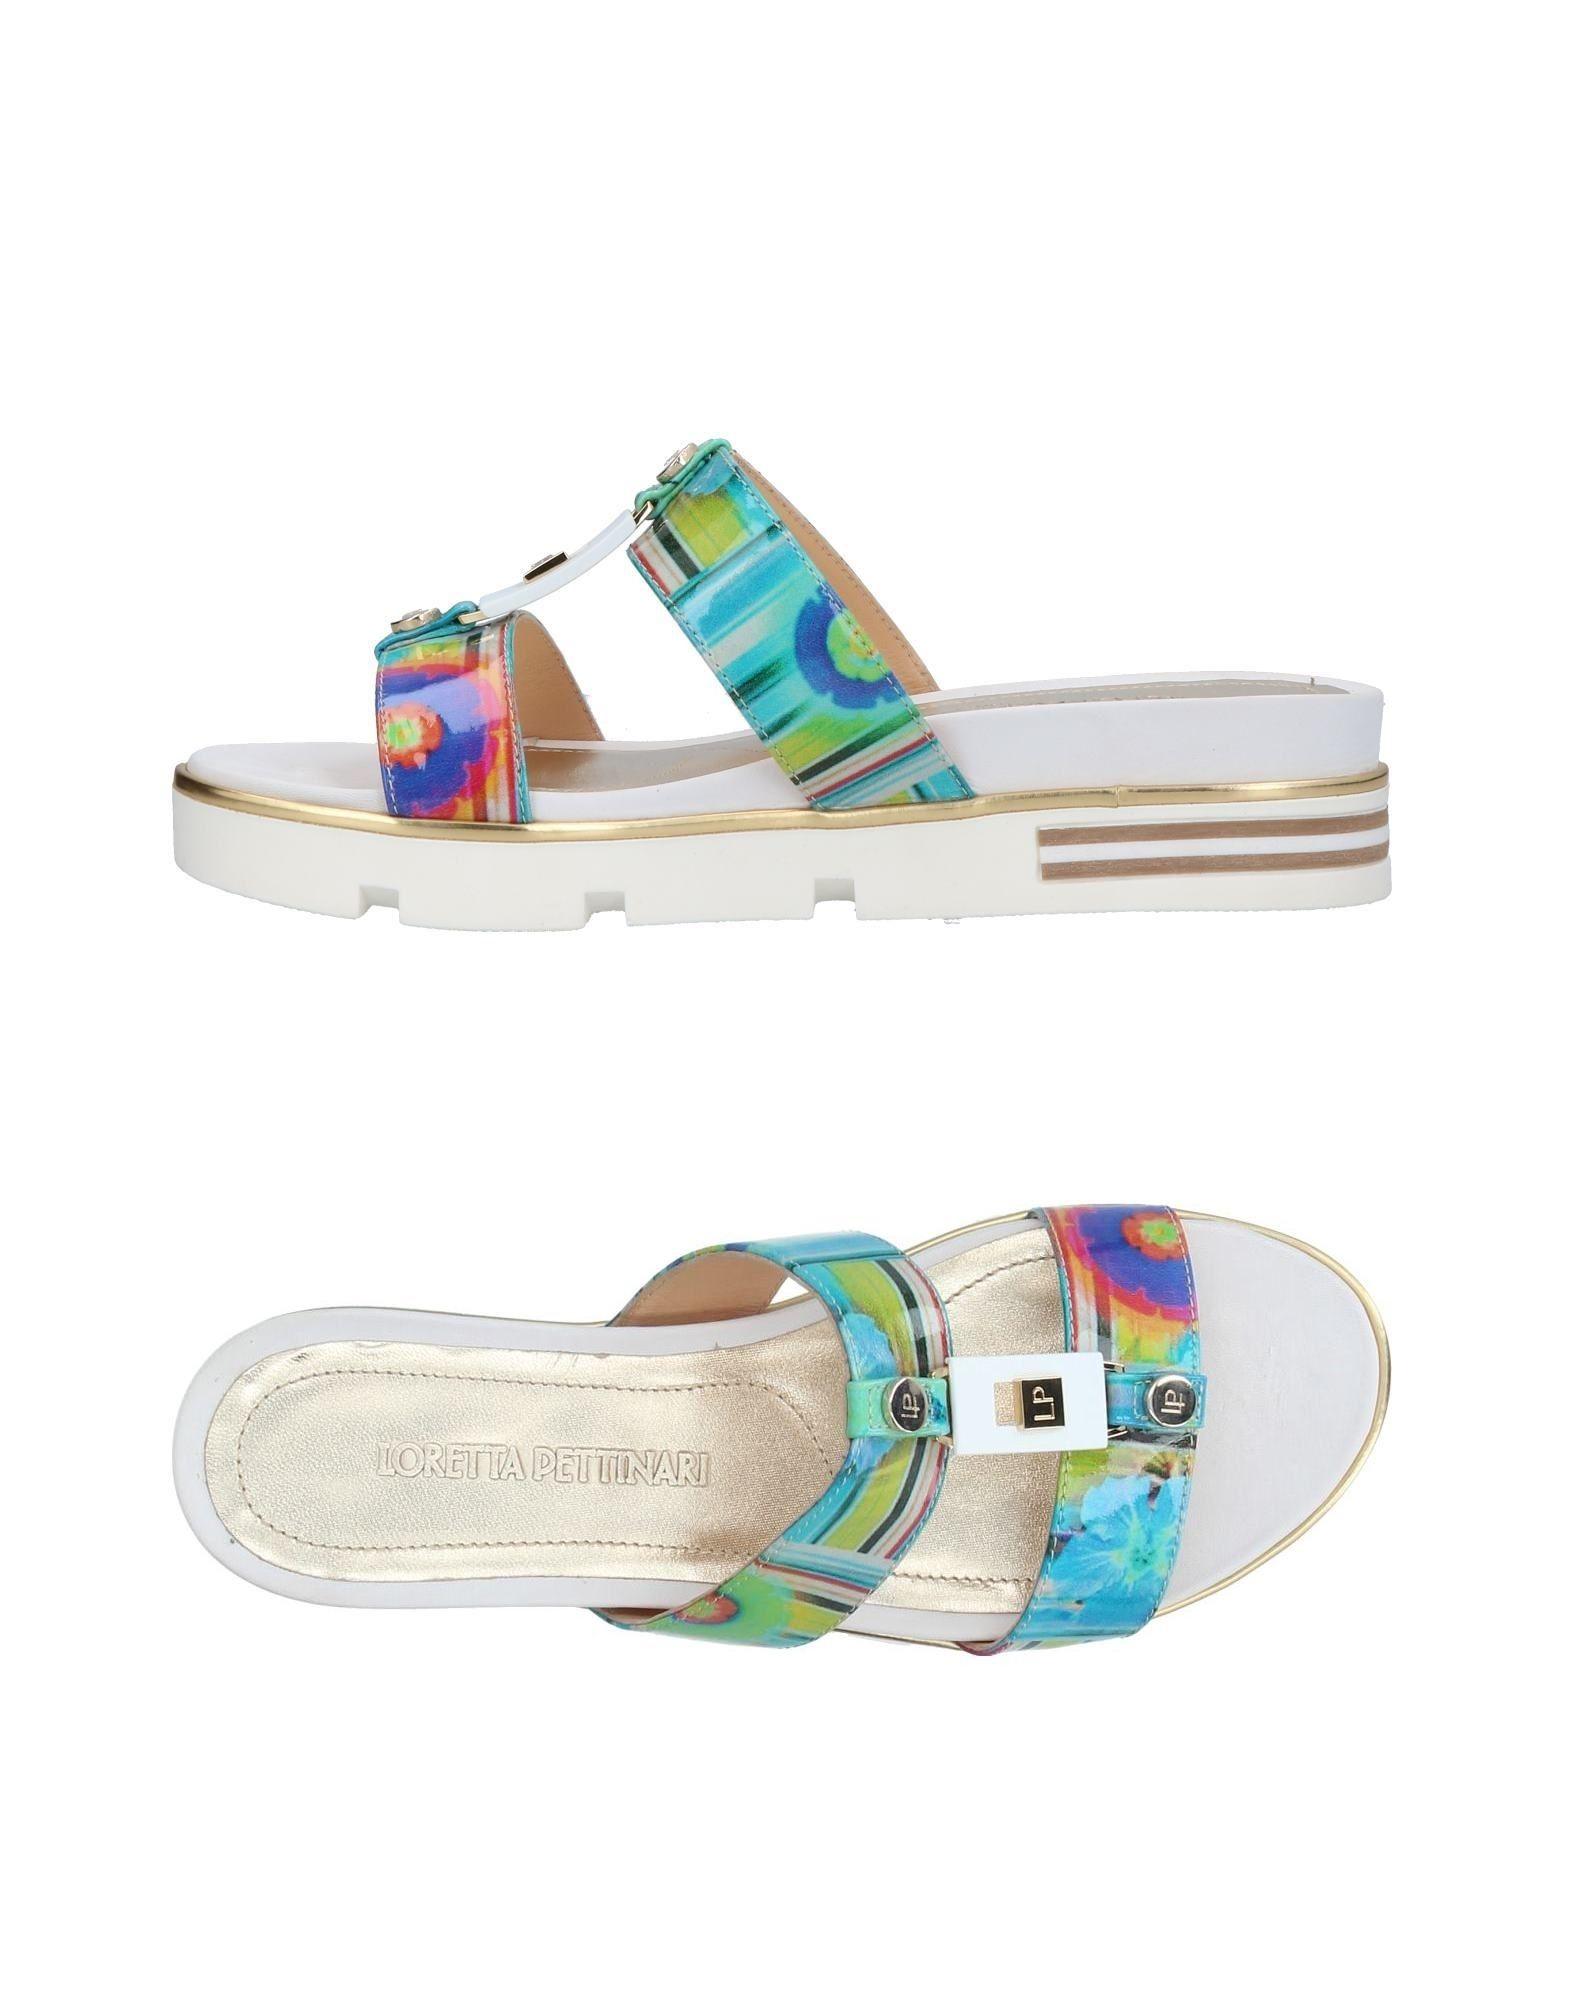 Loretta Pettinari Sandalen Damen  11385855LK Gute Qualität beliebte Schuhe